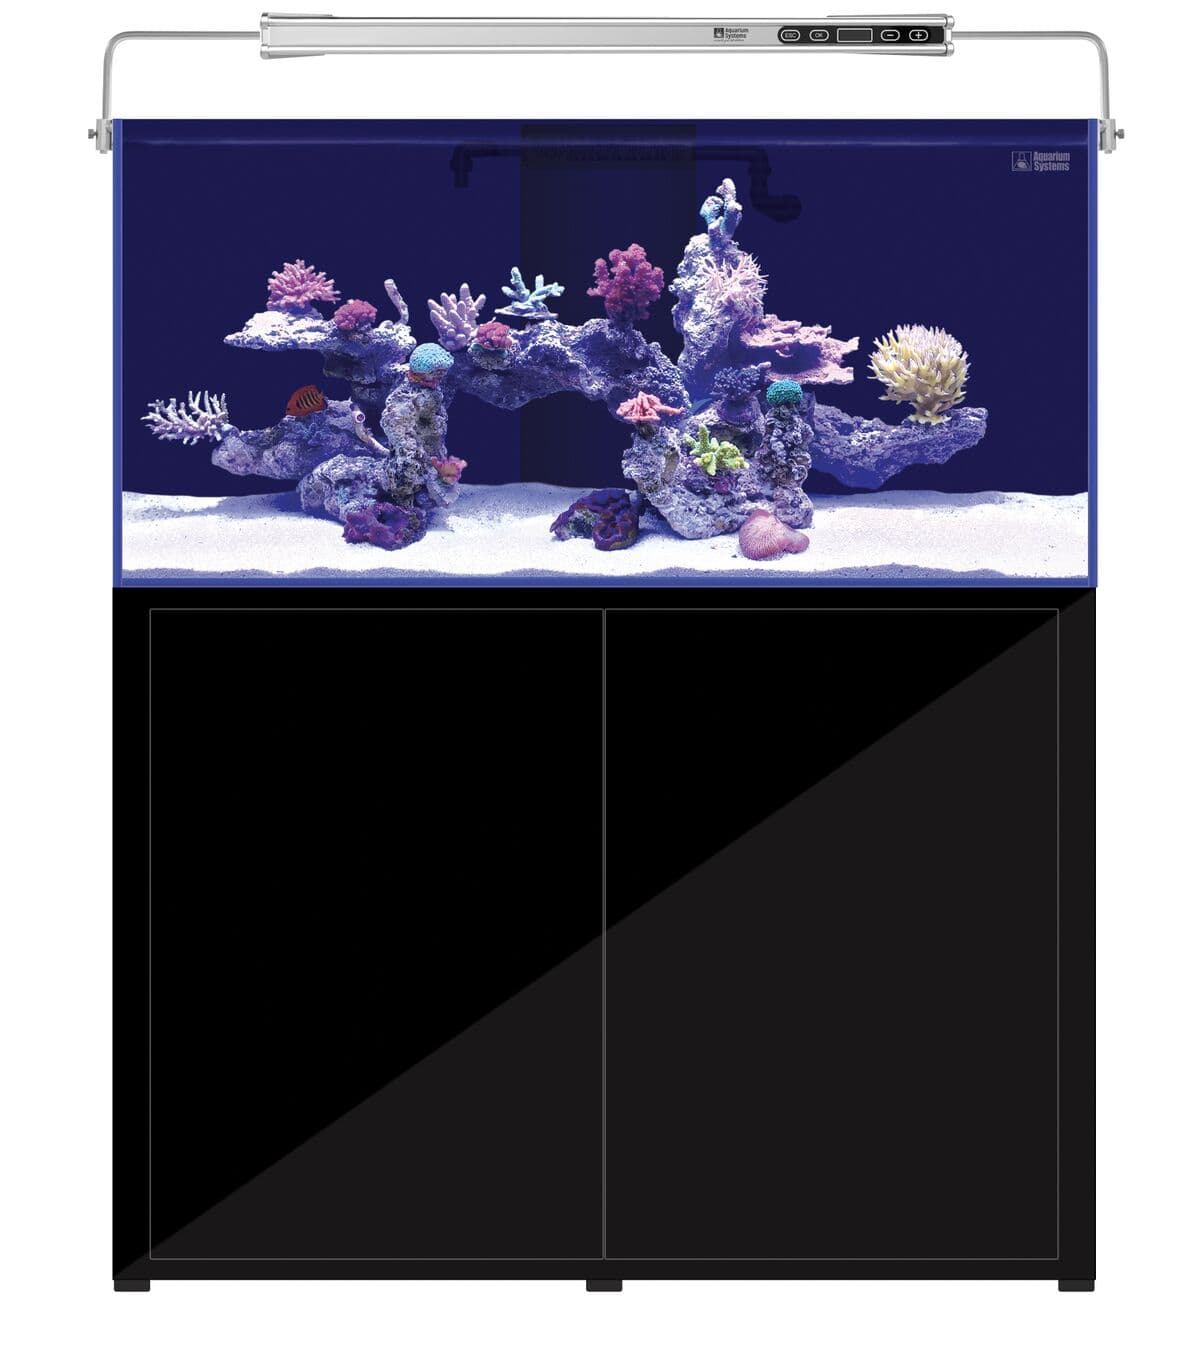 AQUARIUM SYSTEMS L\'Aquarium 570 Noir version 2.0 combinaison aquarium 375 L et meuble